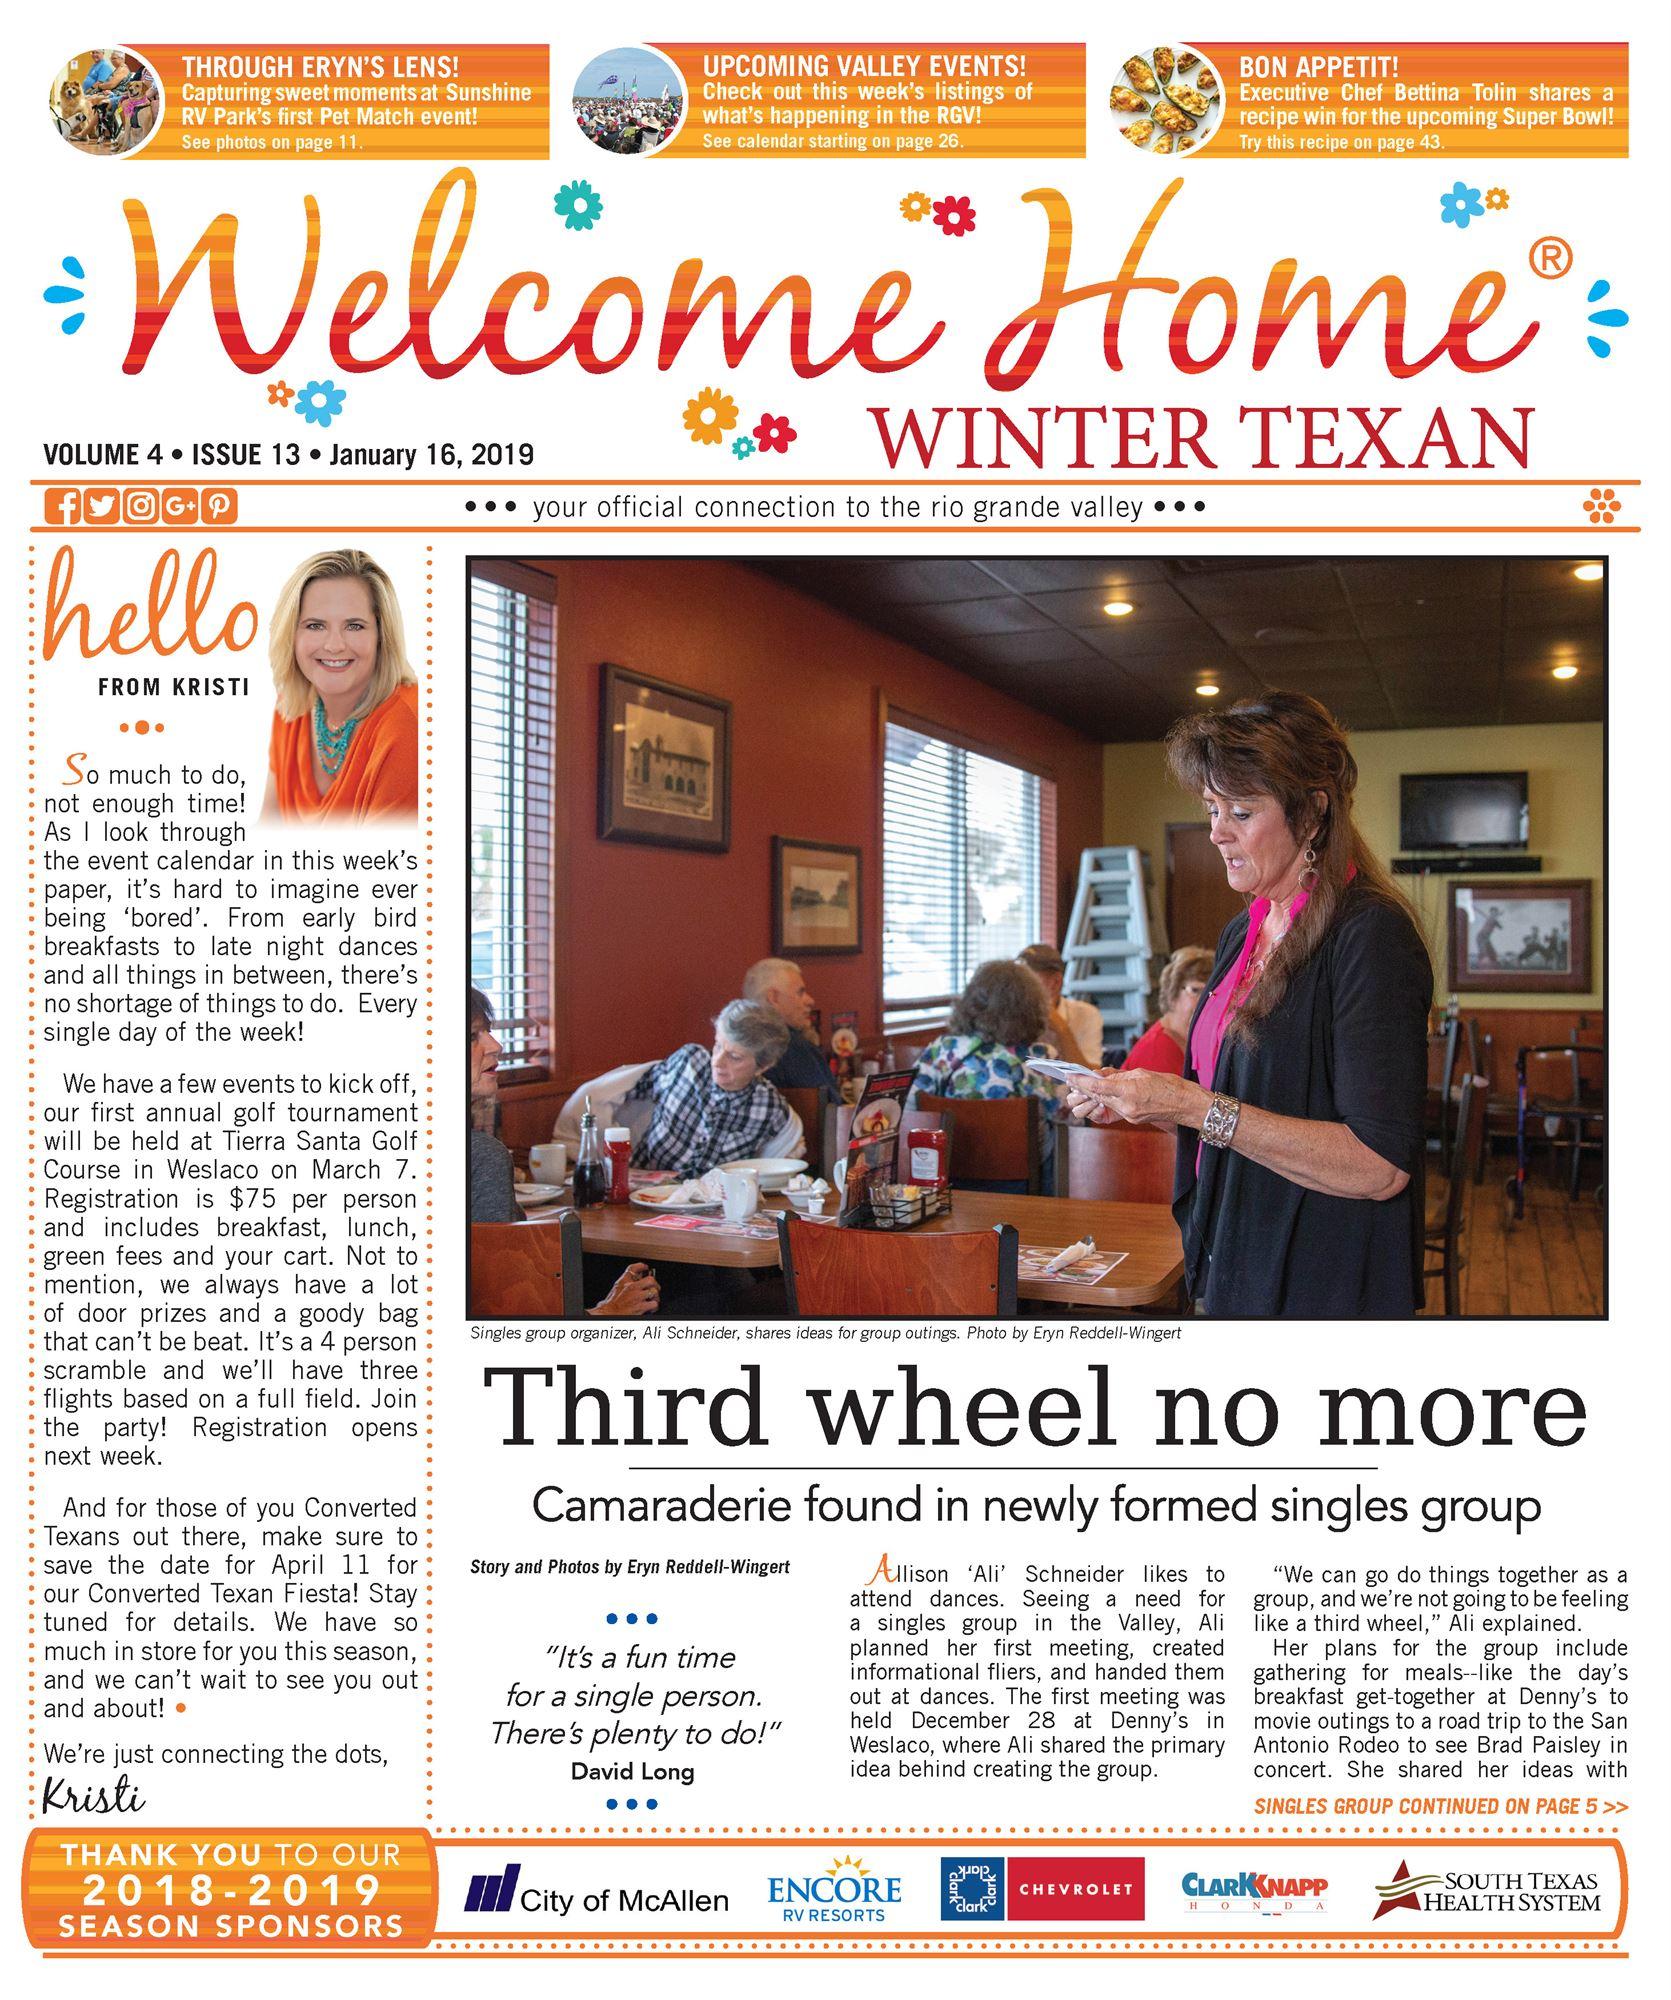 Welcome Home Winter Texan